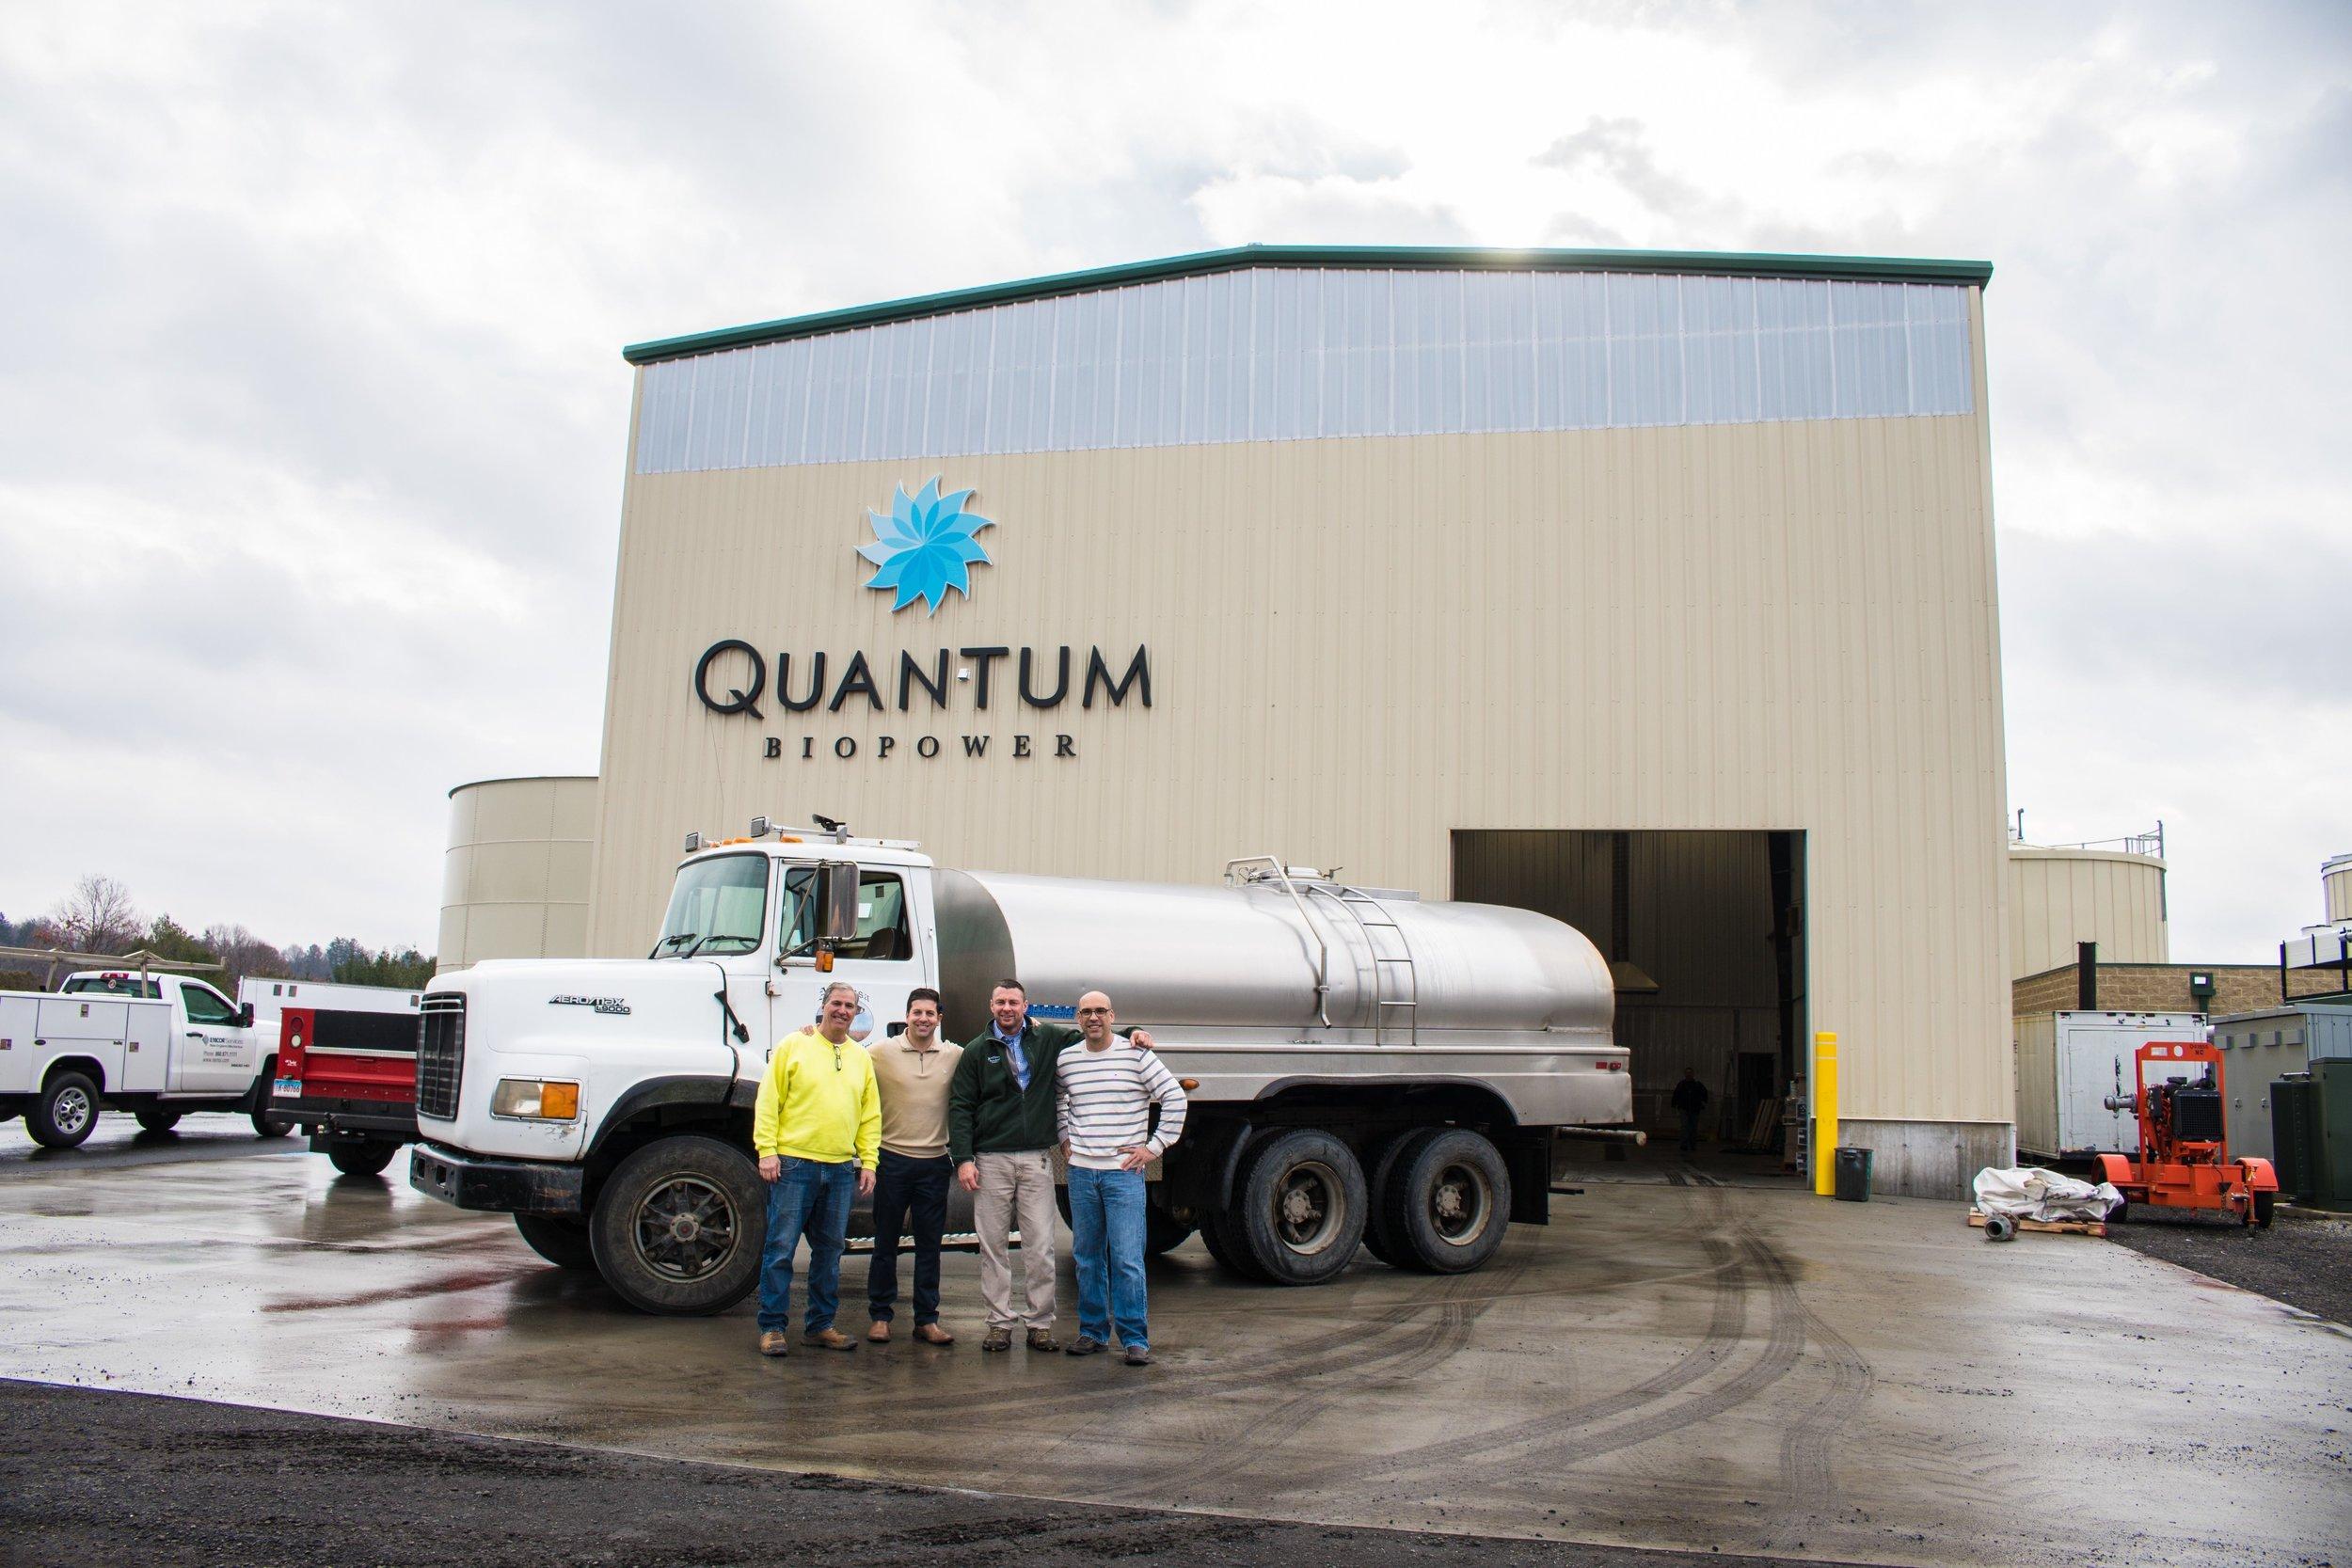 Arethusa Farm Dairy and Quantum Biopower